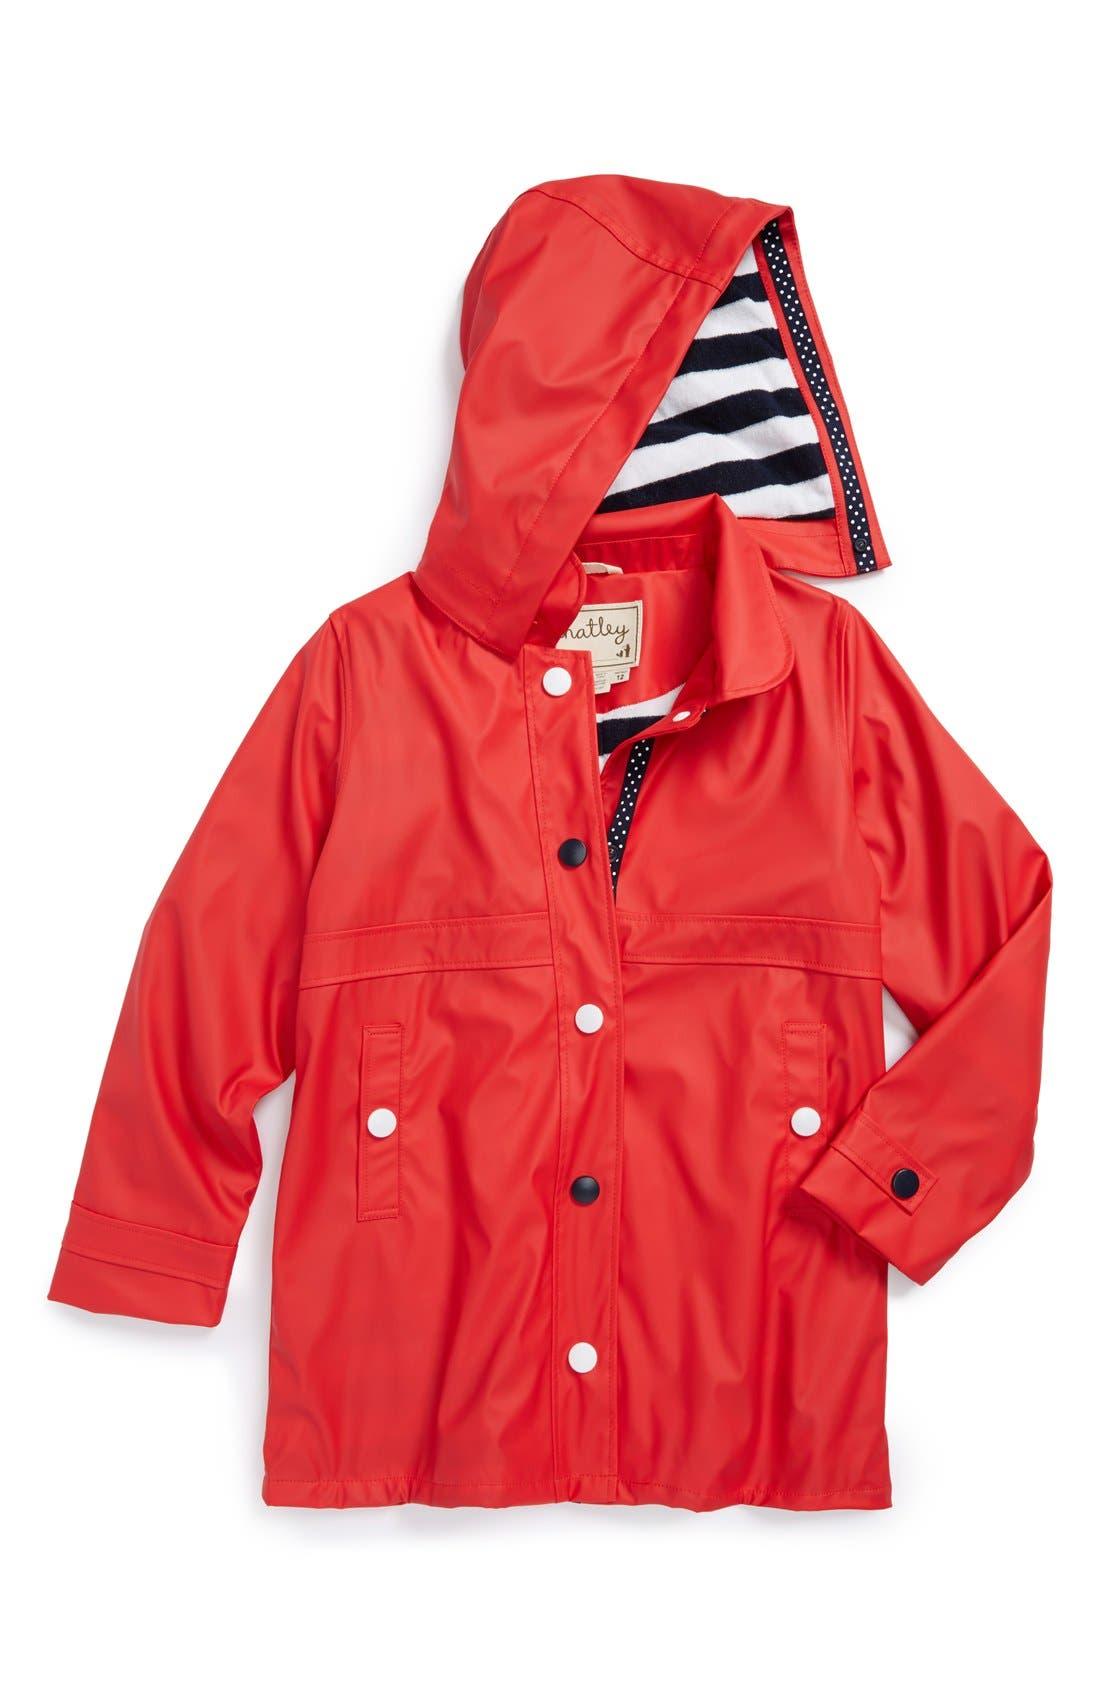 Alternate Image 1 Selected - Hatley 'Splash' Terry Lined Waterproof Rain Jacket (Toddler Girls, Little Girls & Big Girls)